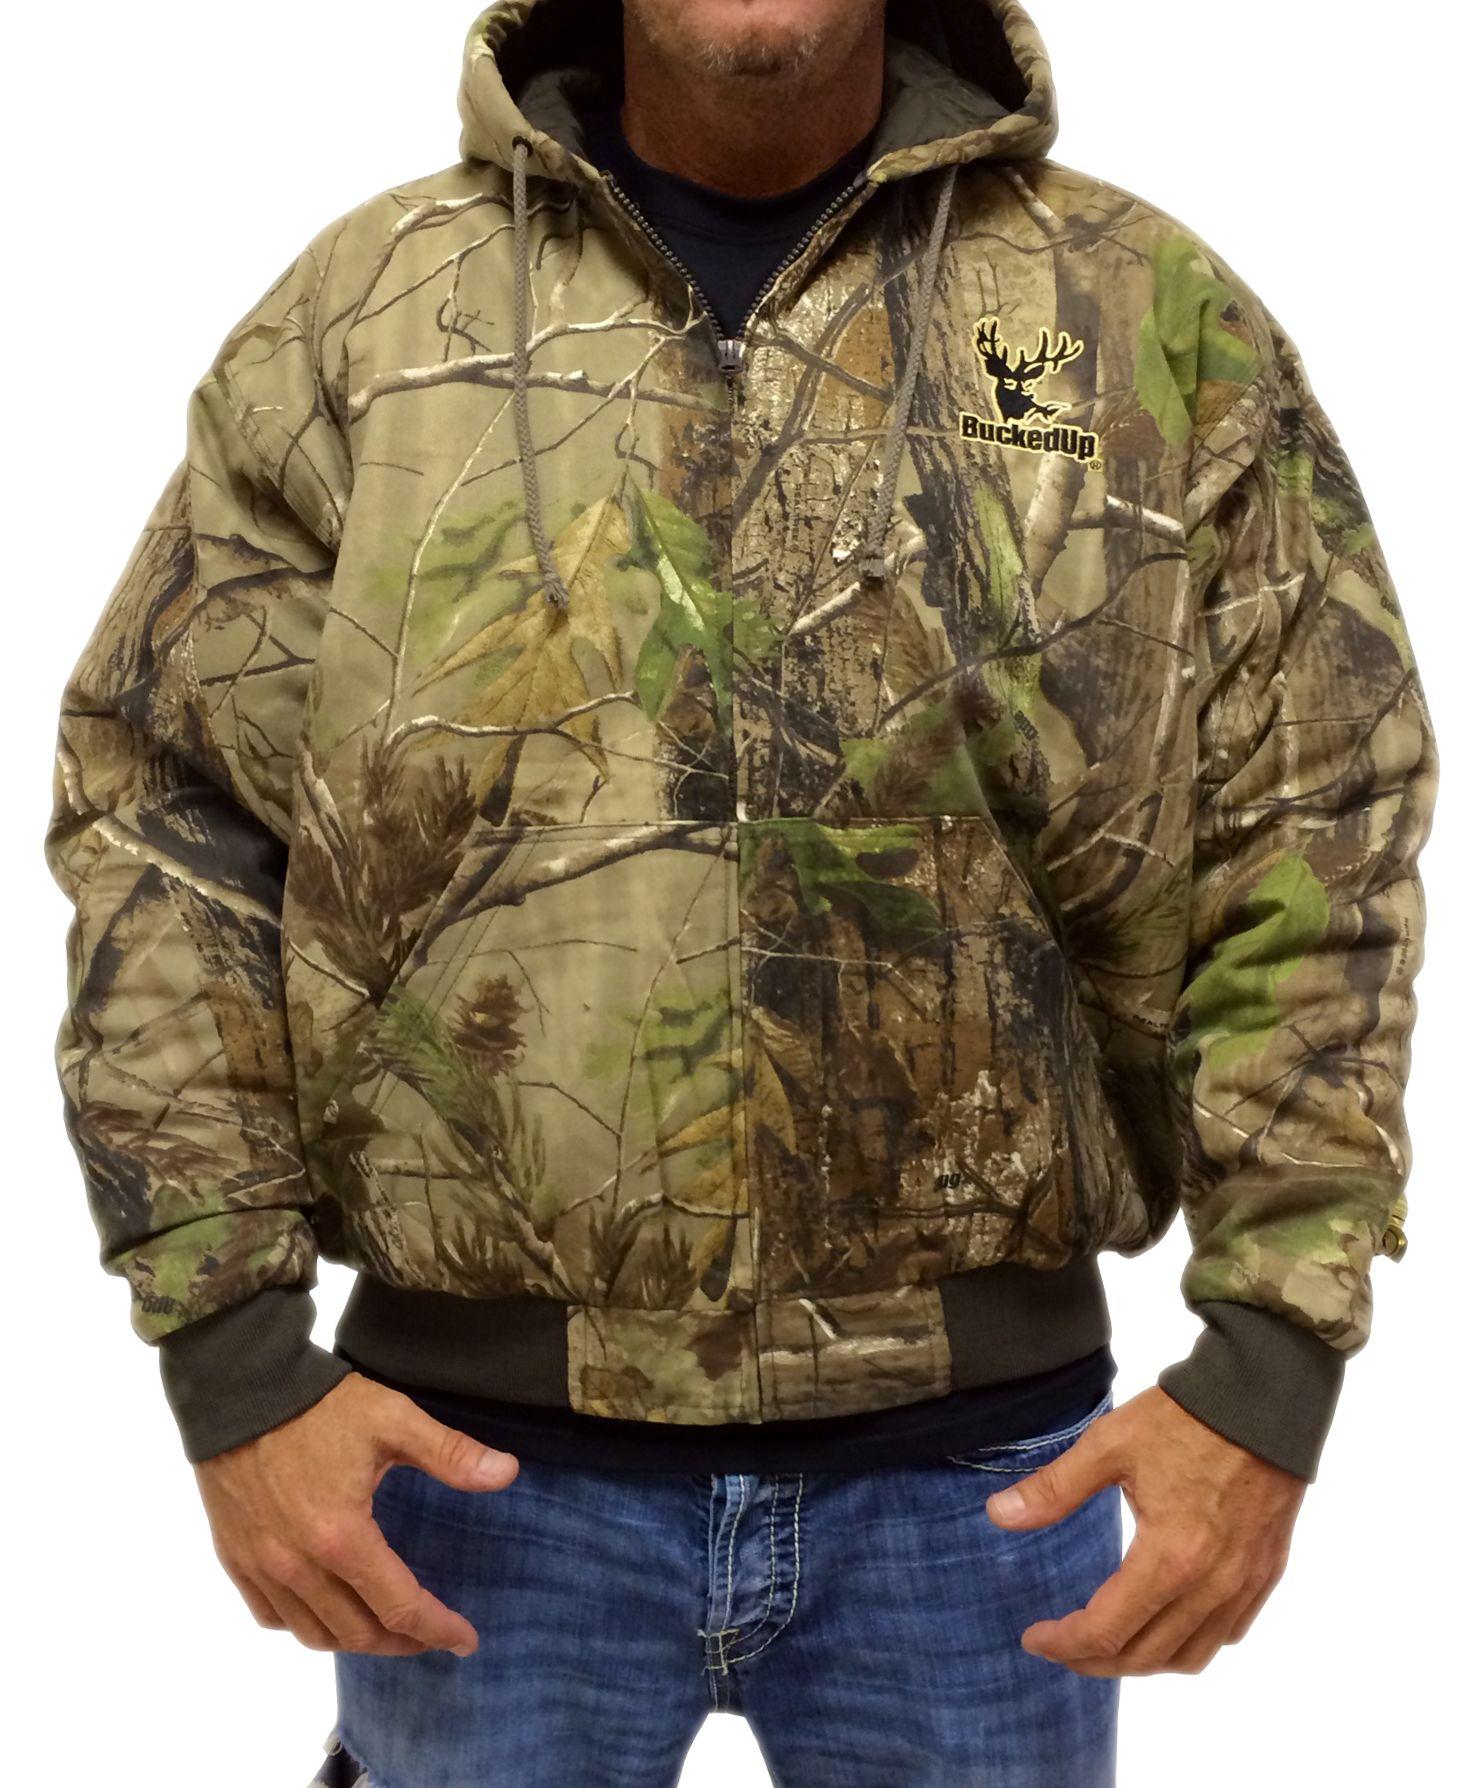 Urban Camouflage Snow camo Full zip hooded top XL XXL XXXL